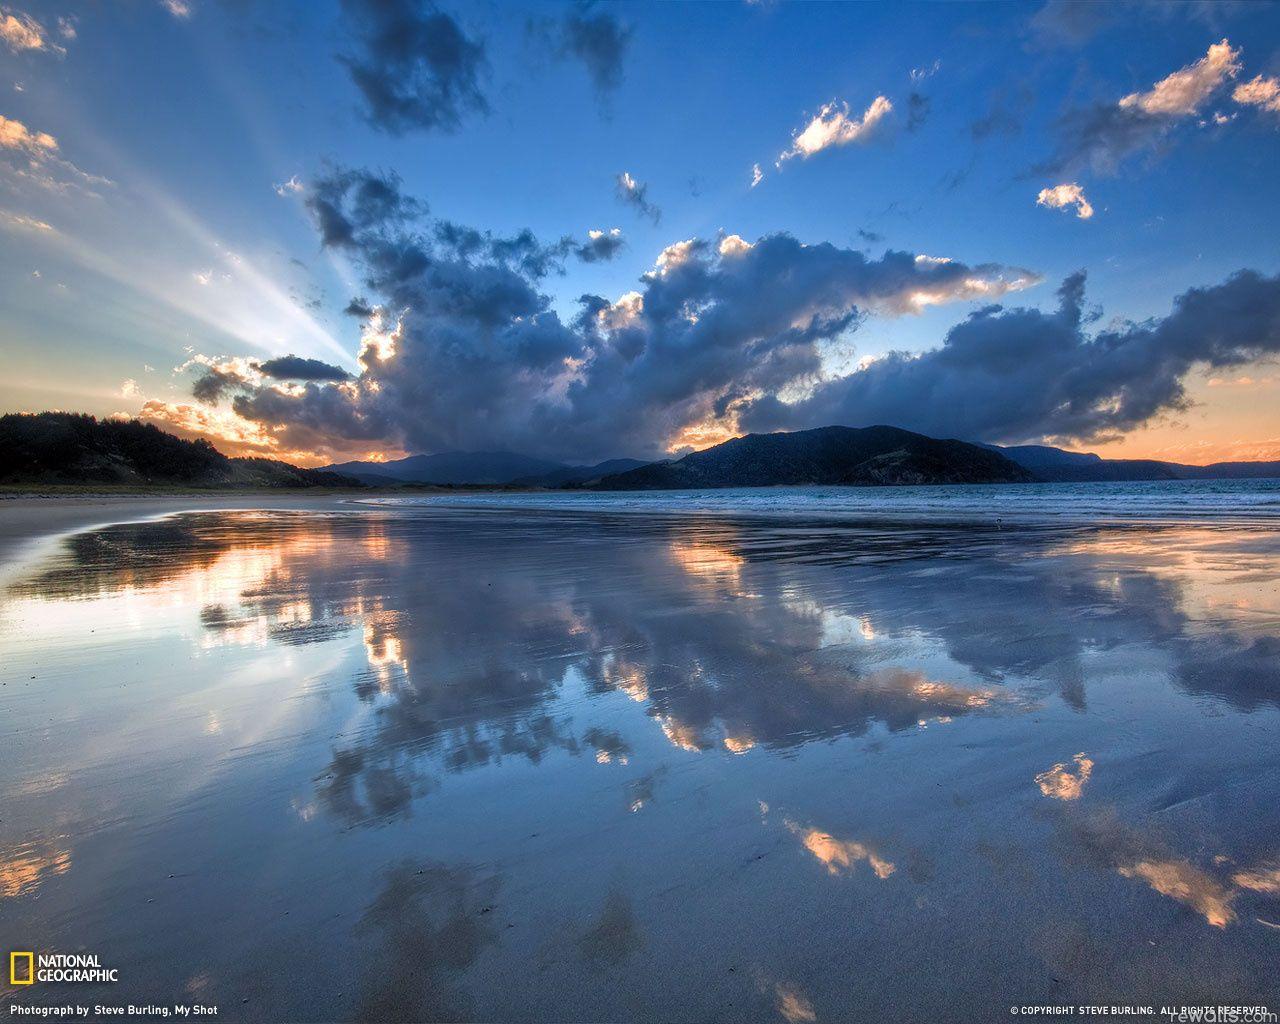 Waikawau Bay, New Zealand  ph. by Steve Burling, My Shot